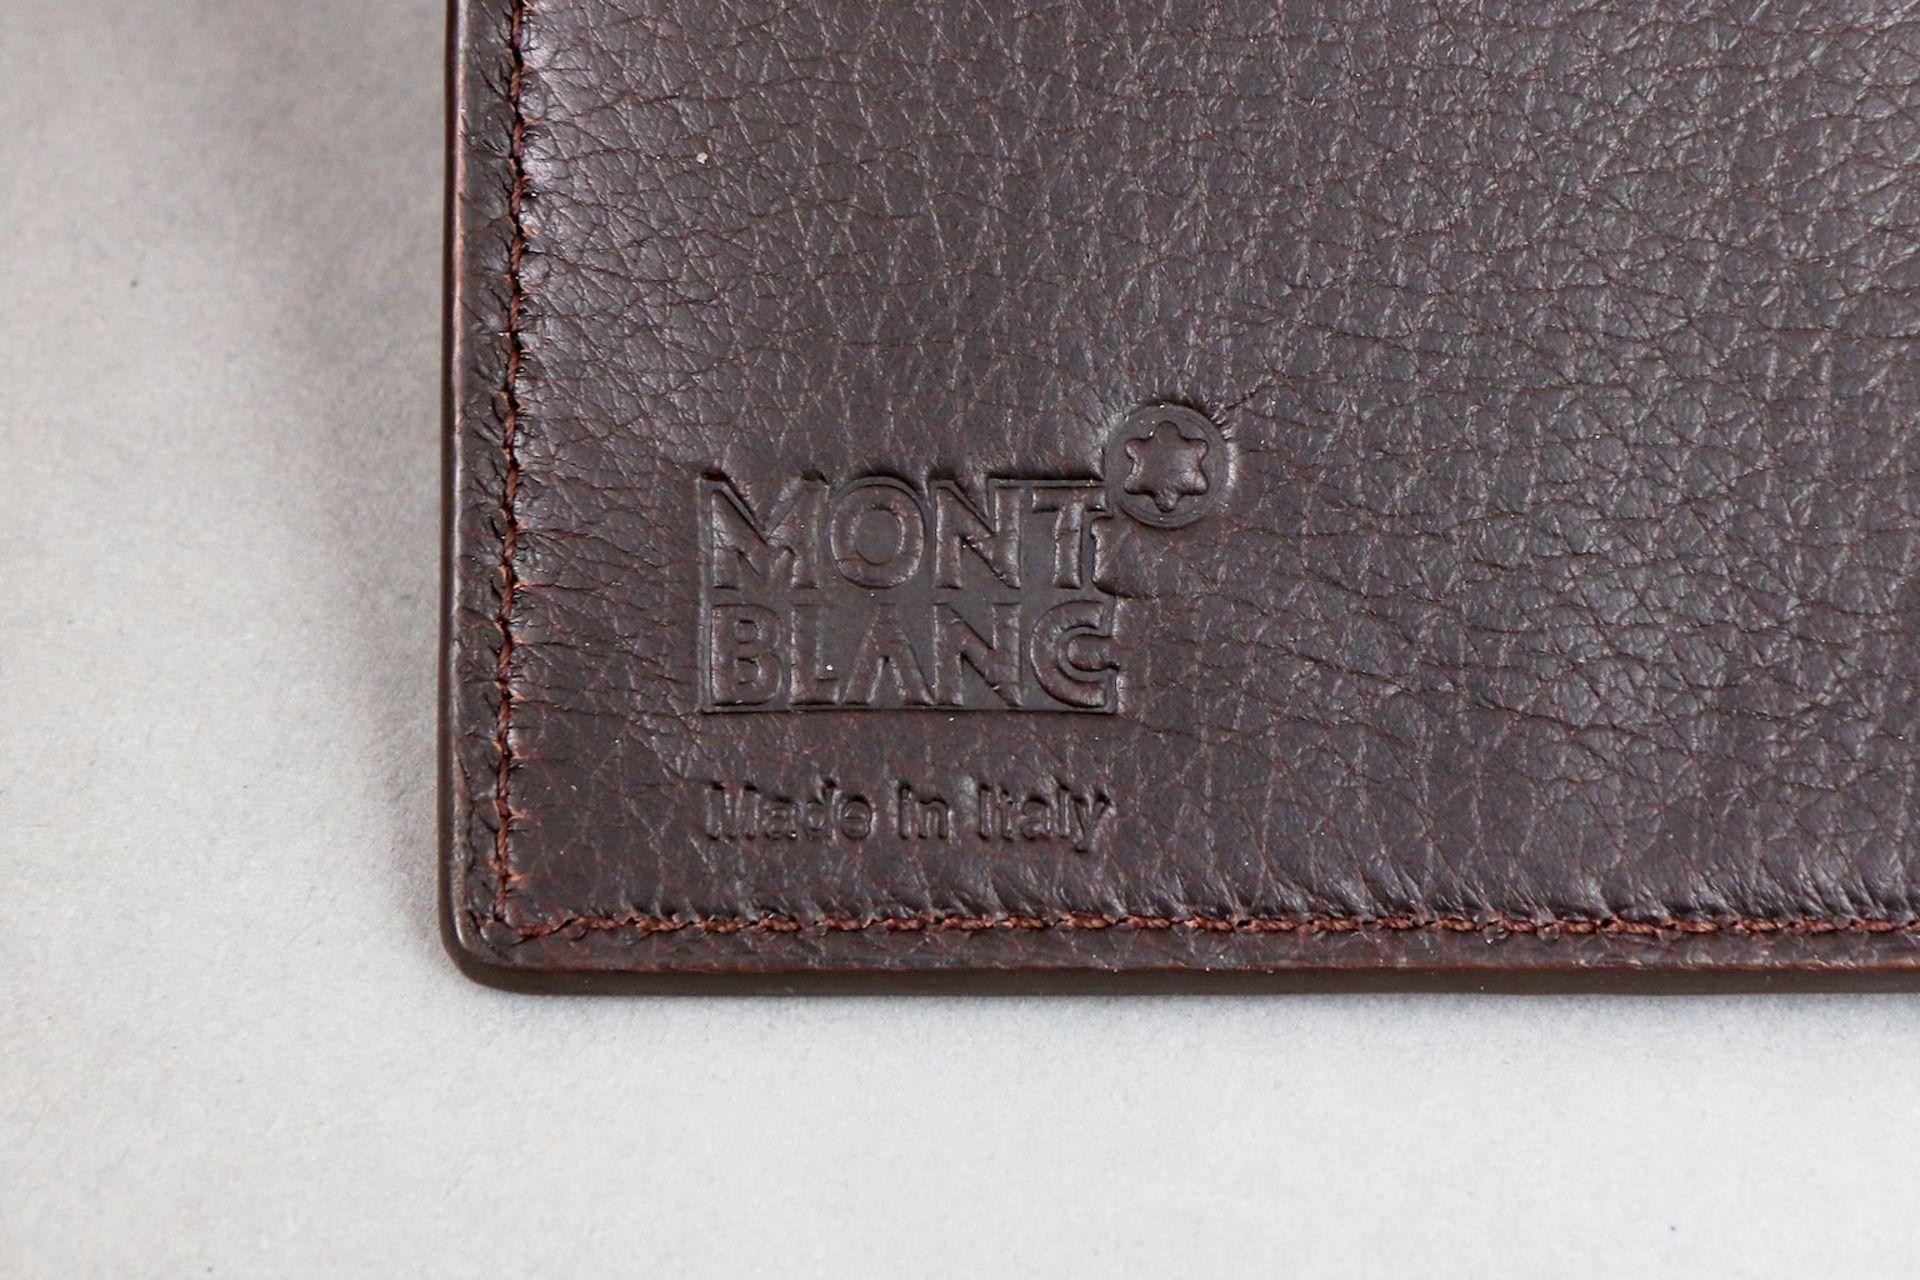 MONTBLANC Portemonnaie/Kartenetui - Image 3 of 4